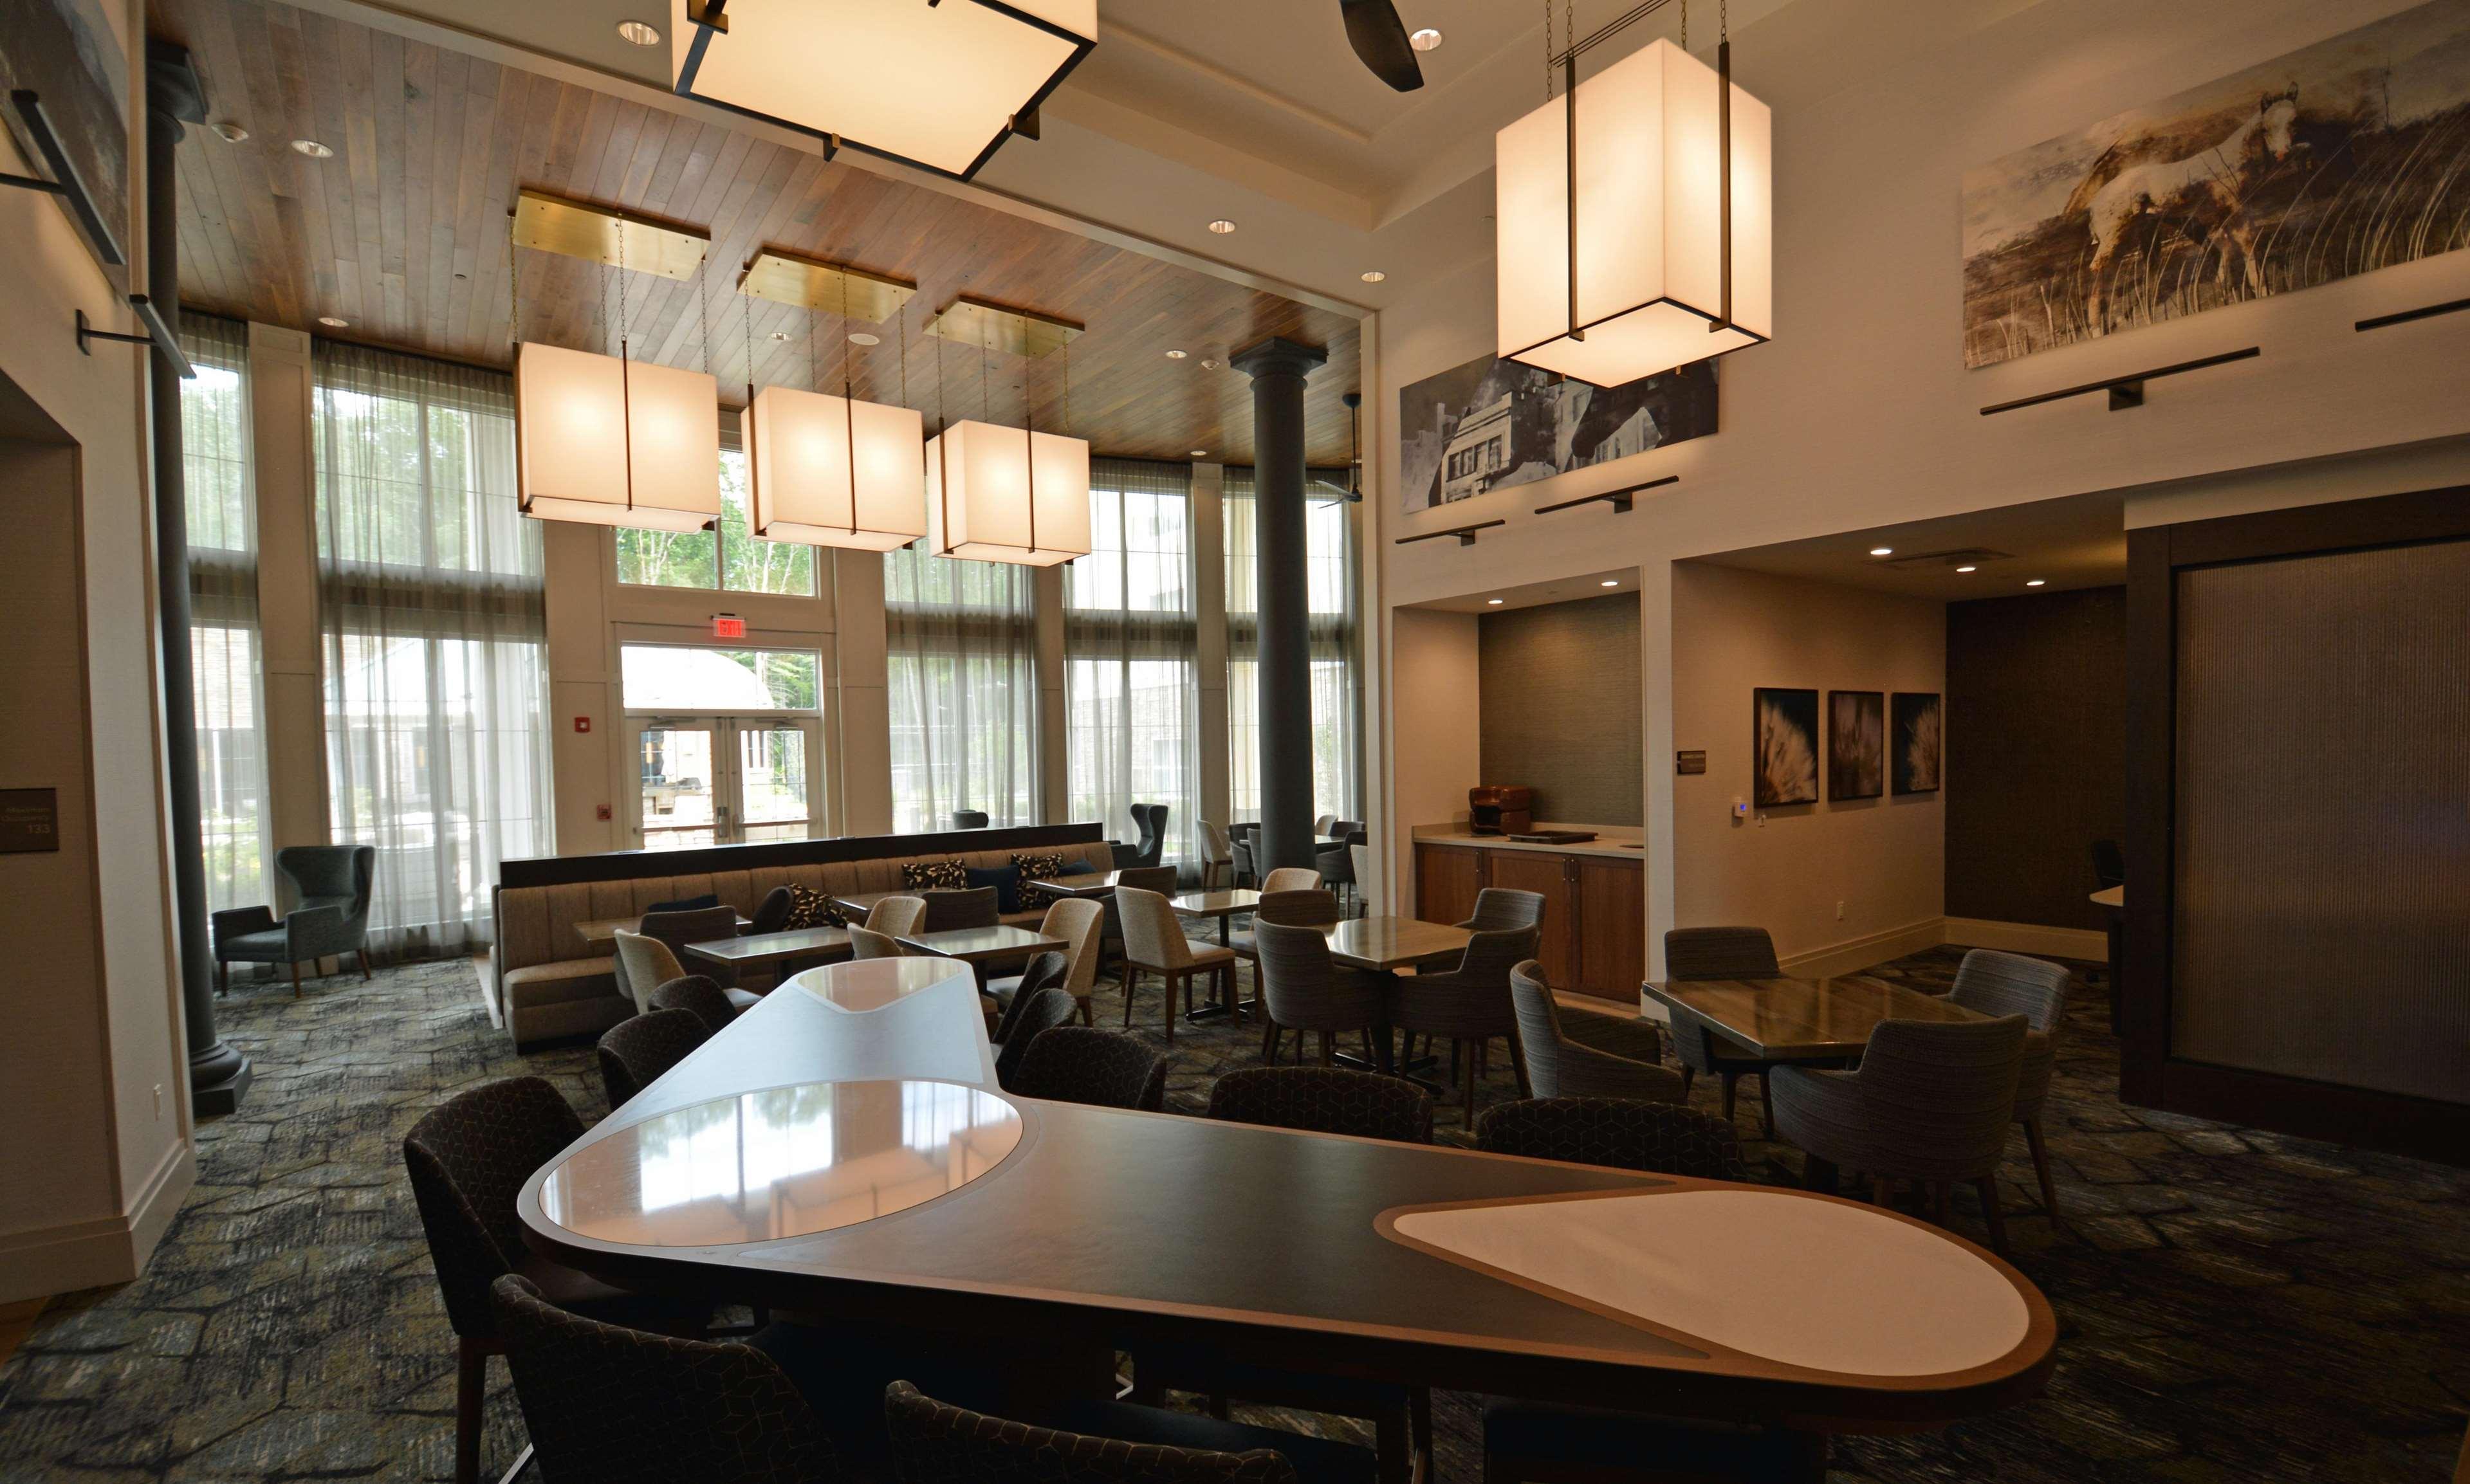 Homewood Suites by Hilton Saratoga Springs image 12